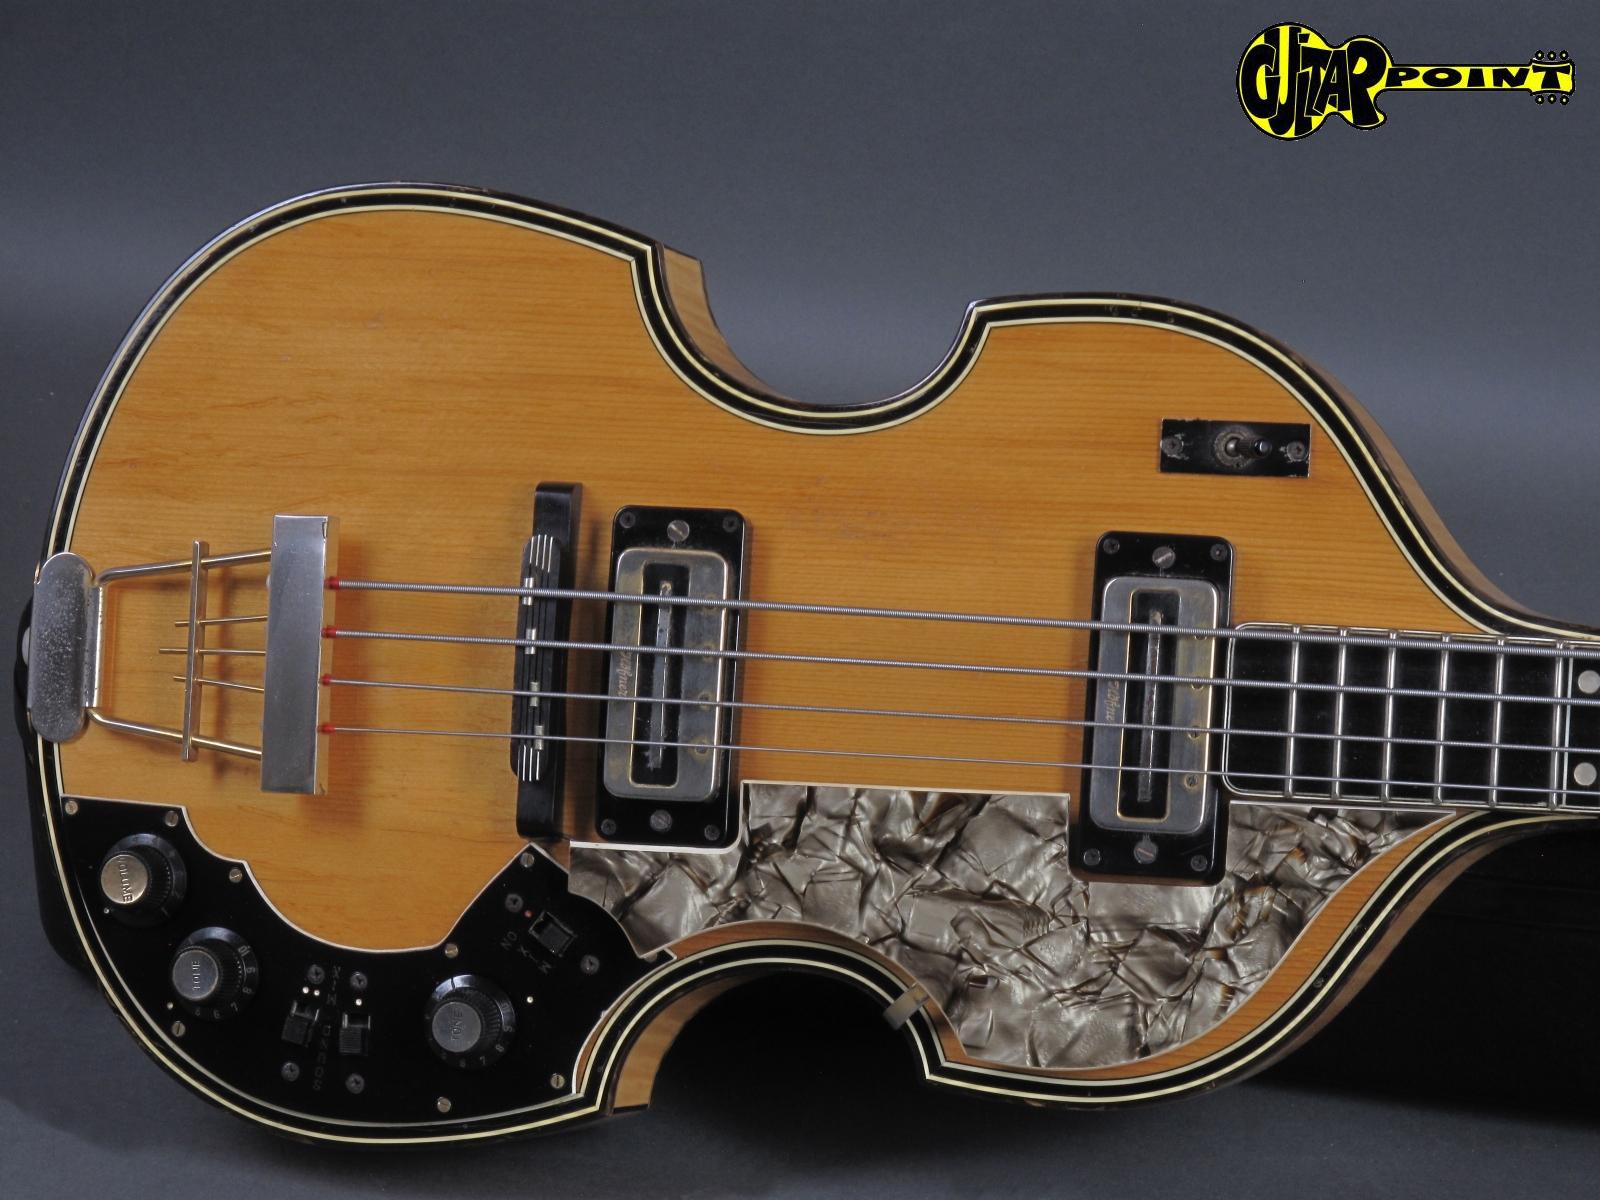 https://guitarpoint.de/app/uploads/products/1970-hofner-5000-1m-super-beatles-bass-natural-2/Hofner70_5000NT_151.jpg